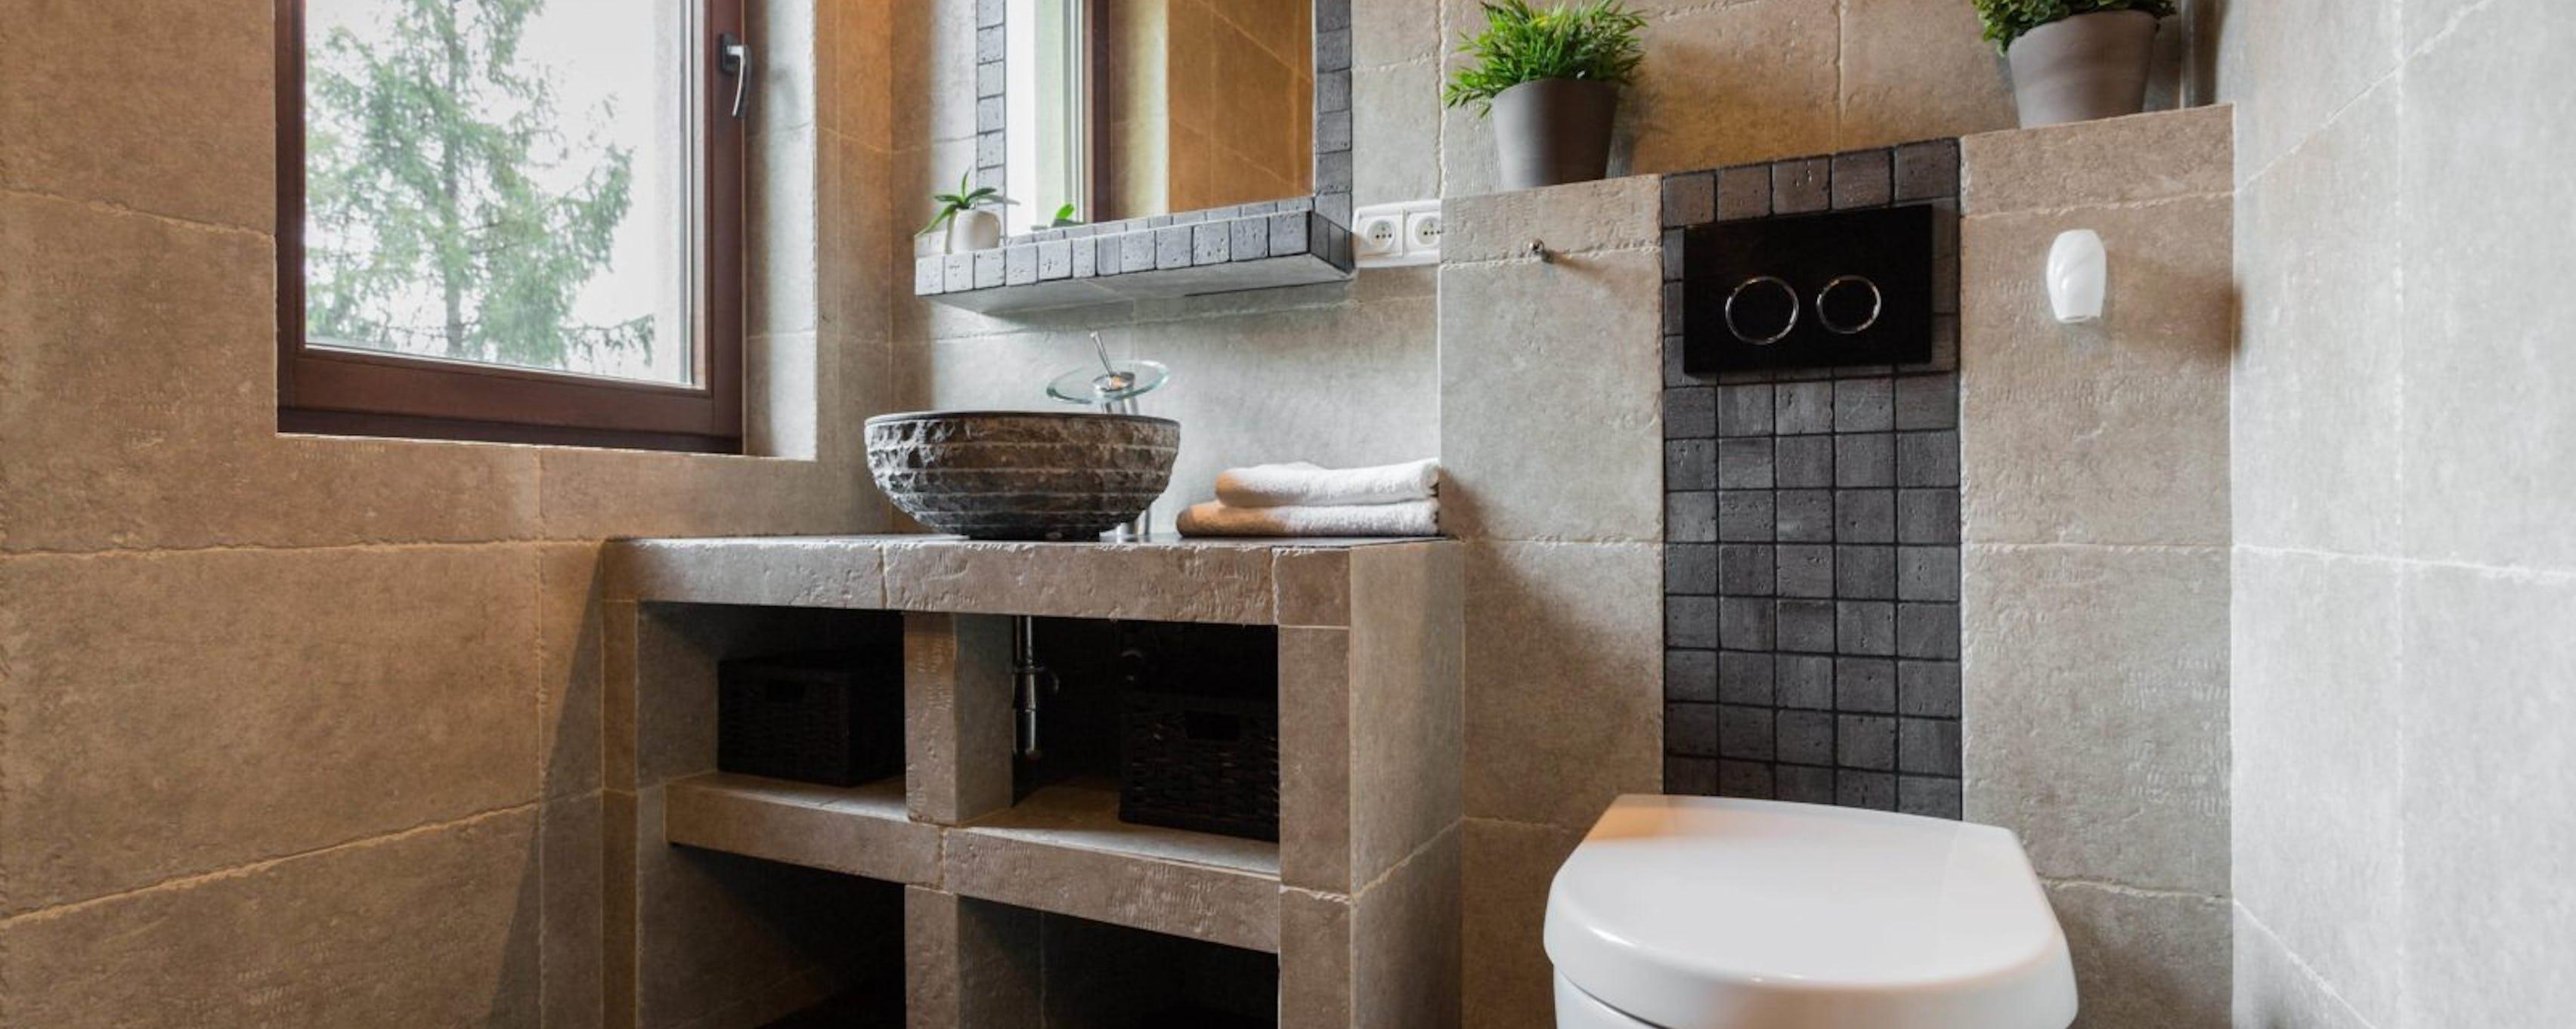 Moderniser Salle De Bain relooker sa salle de bain : notre top 10 conseils relooking